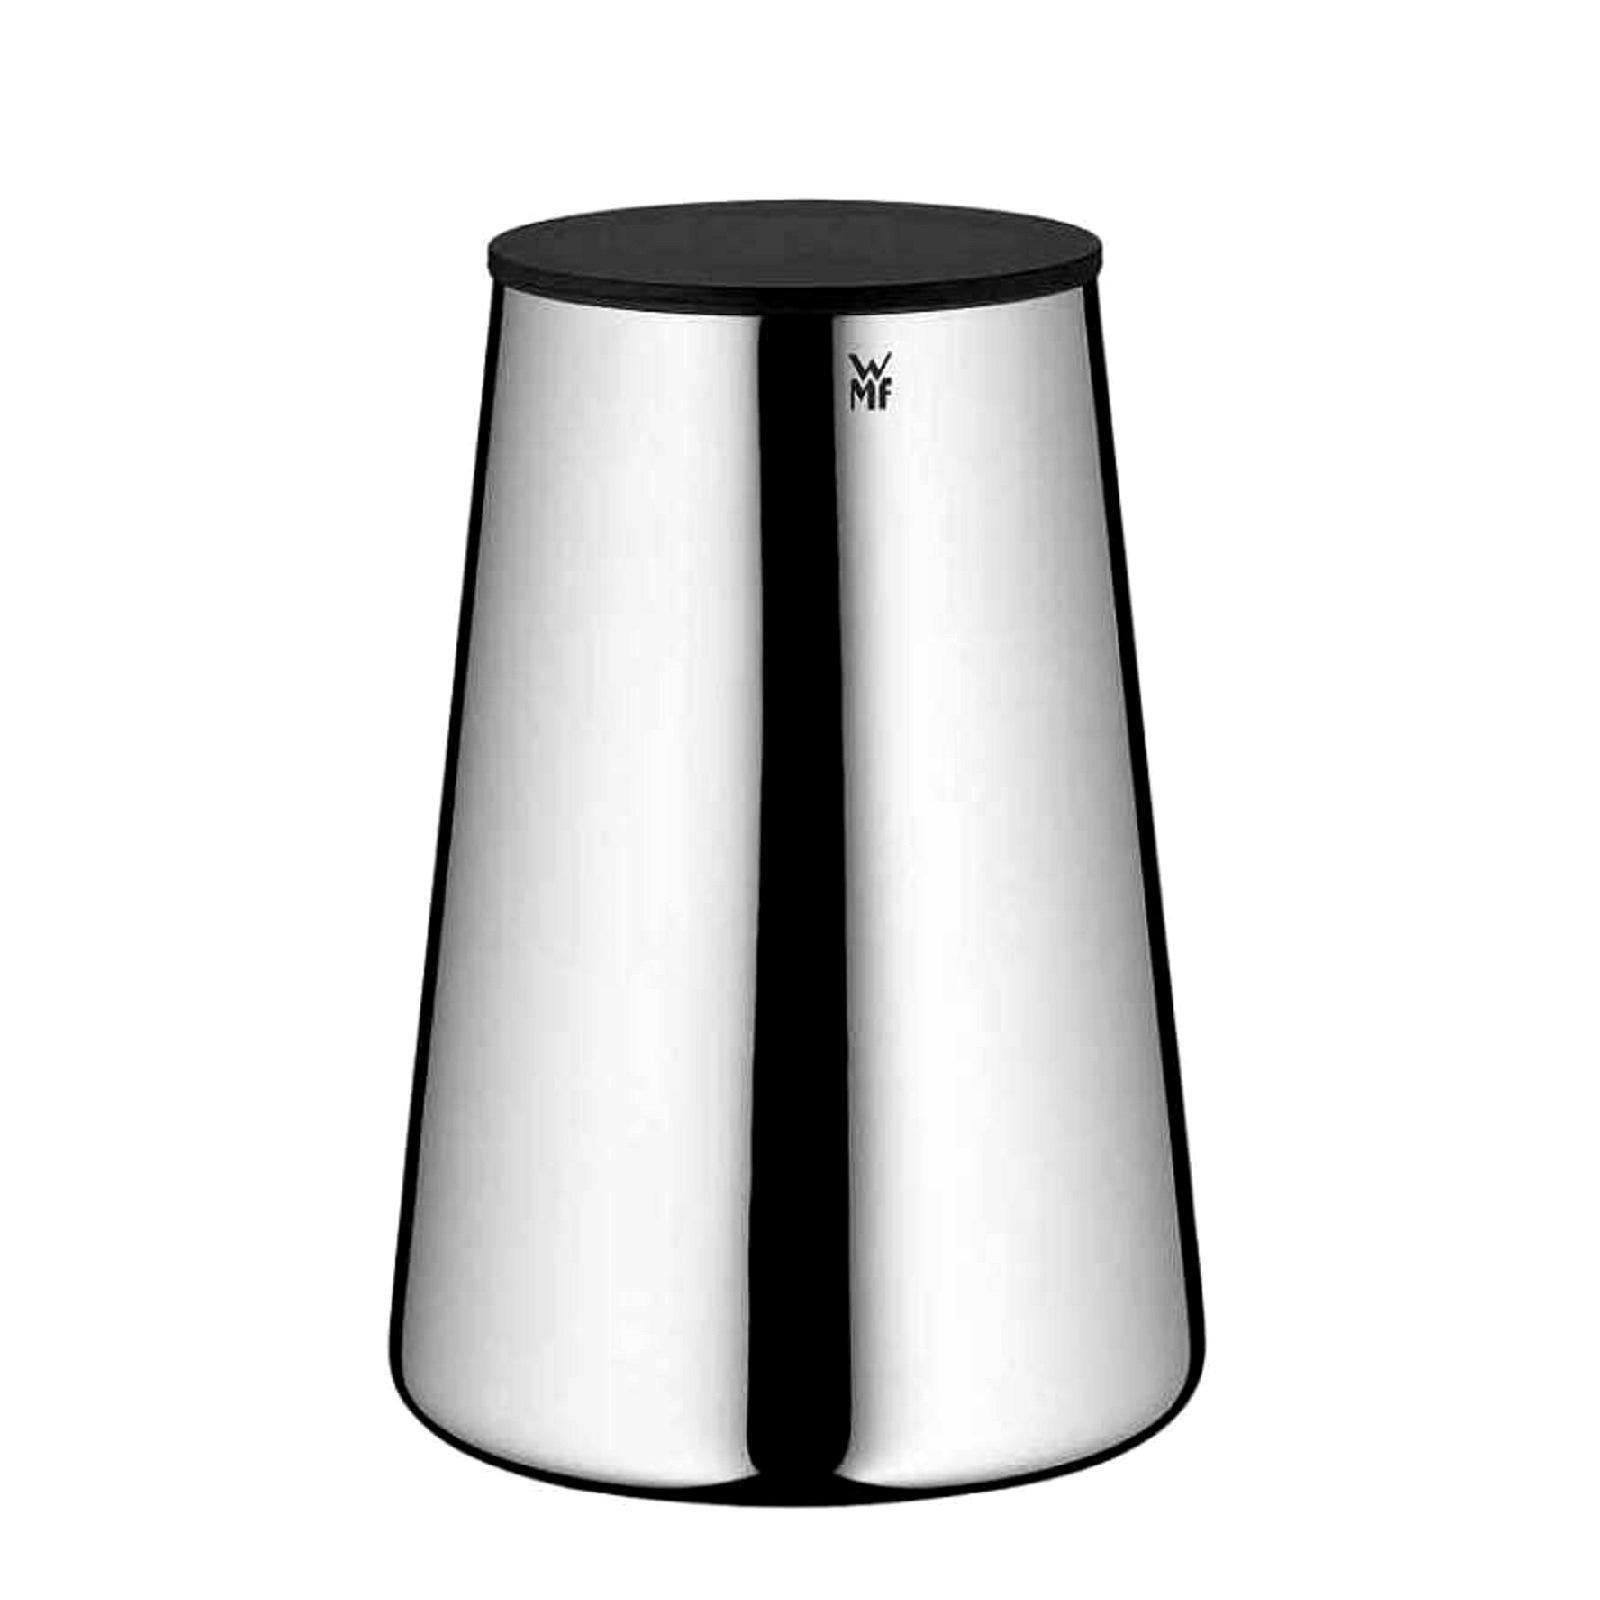 Онлайн каталог PROMENU: Банка для чая WMF TEA TIME, диаметр 9,2 см, высота 12,9 см, серебристый WMF 06 3634 6040